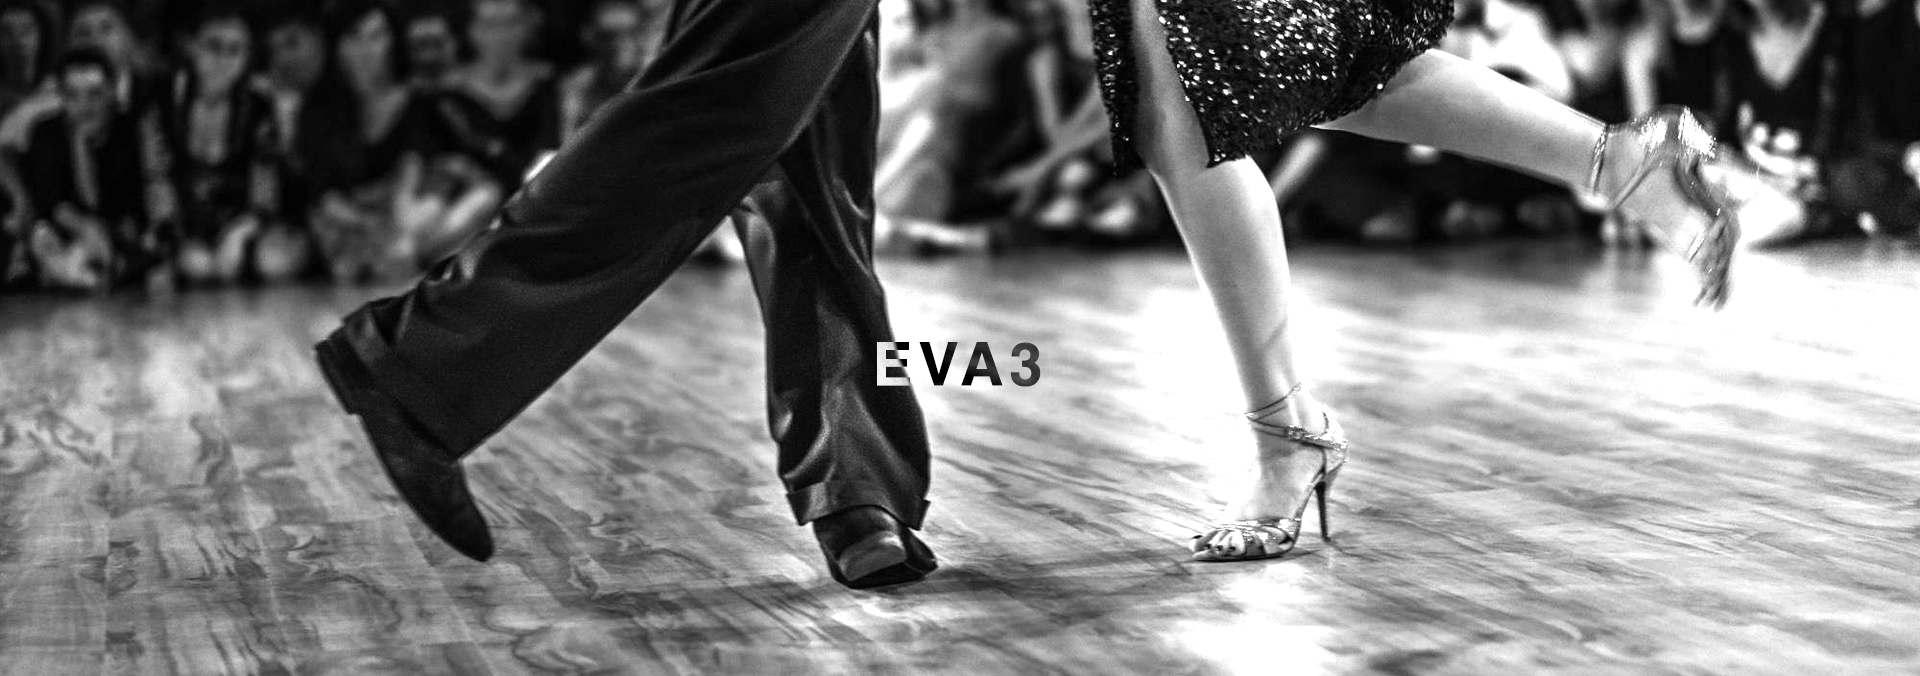 Eva3 Twins Star Dancers